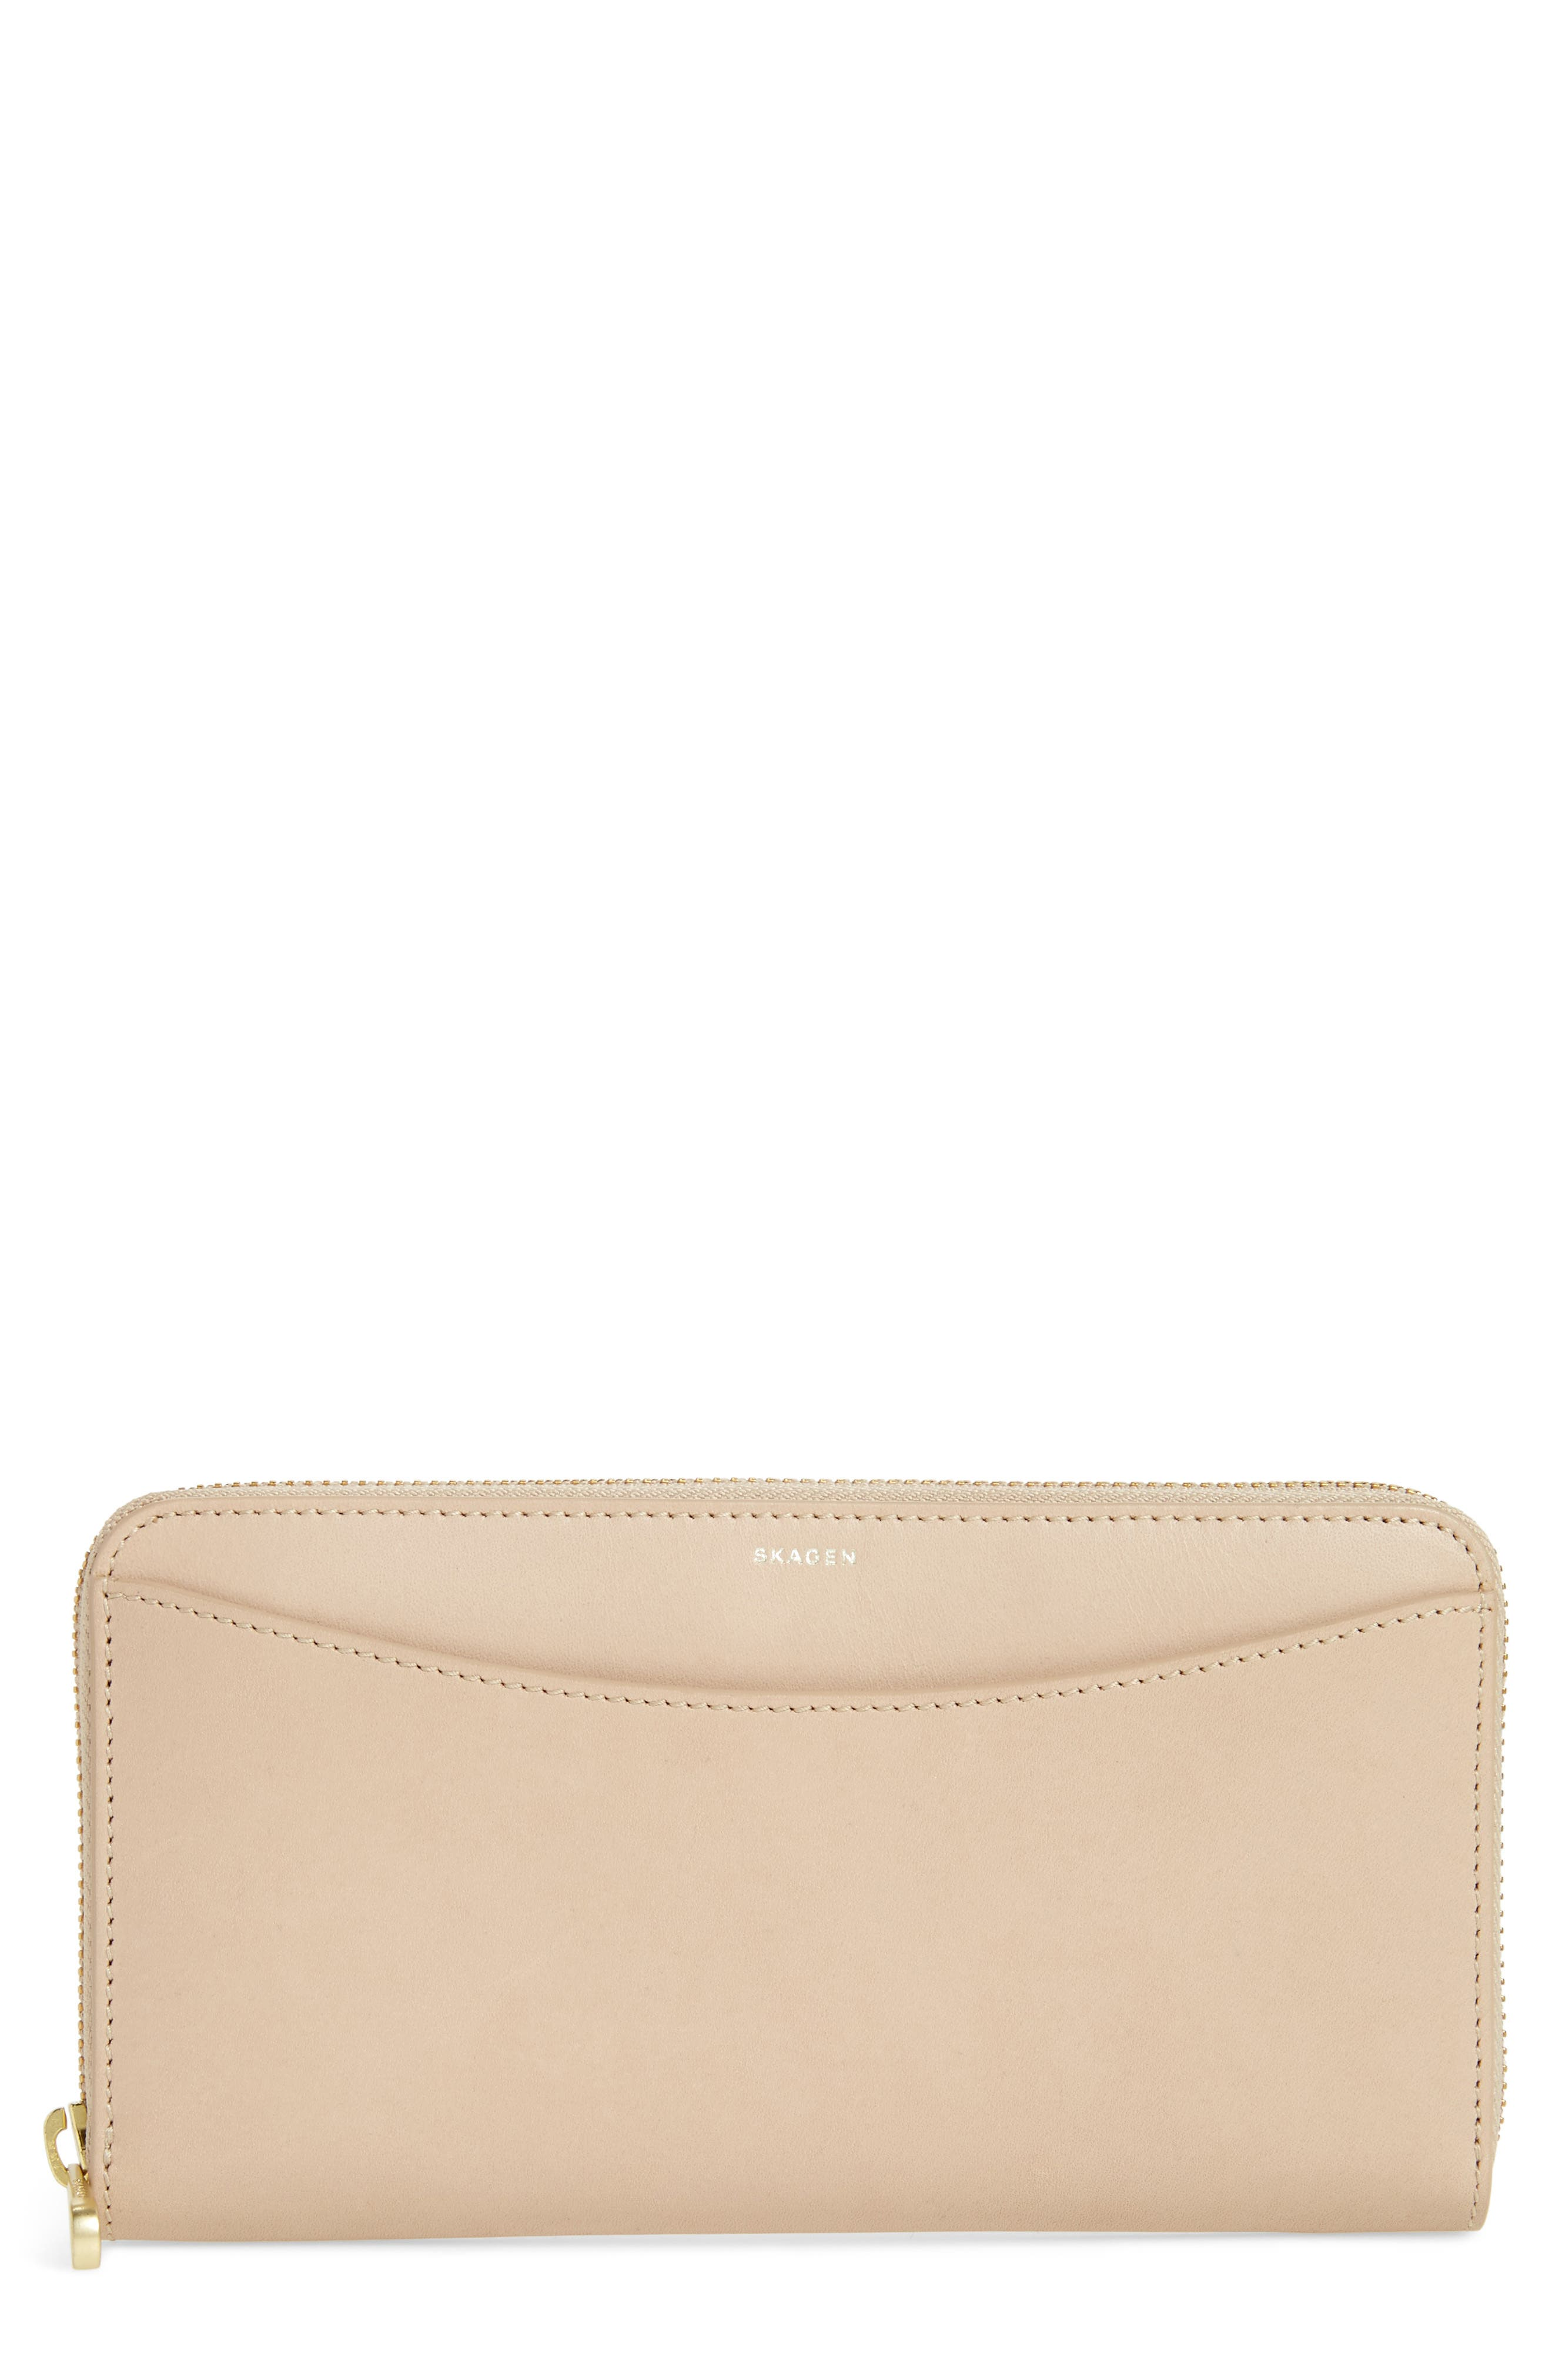 Alternate Image 1 Selected - Skagen Leather Continental Wallet